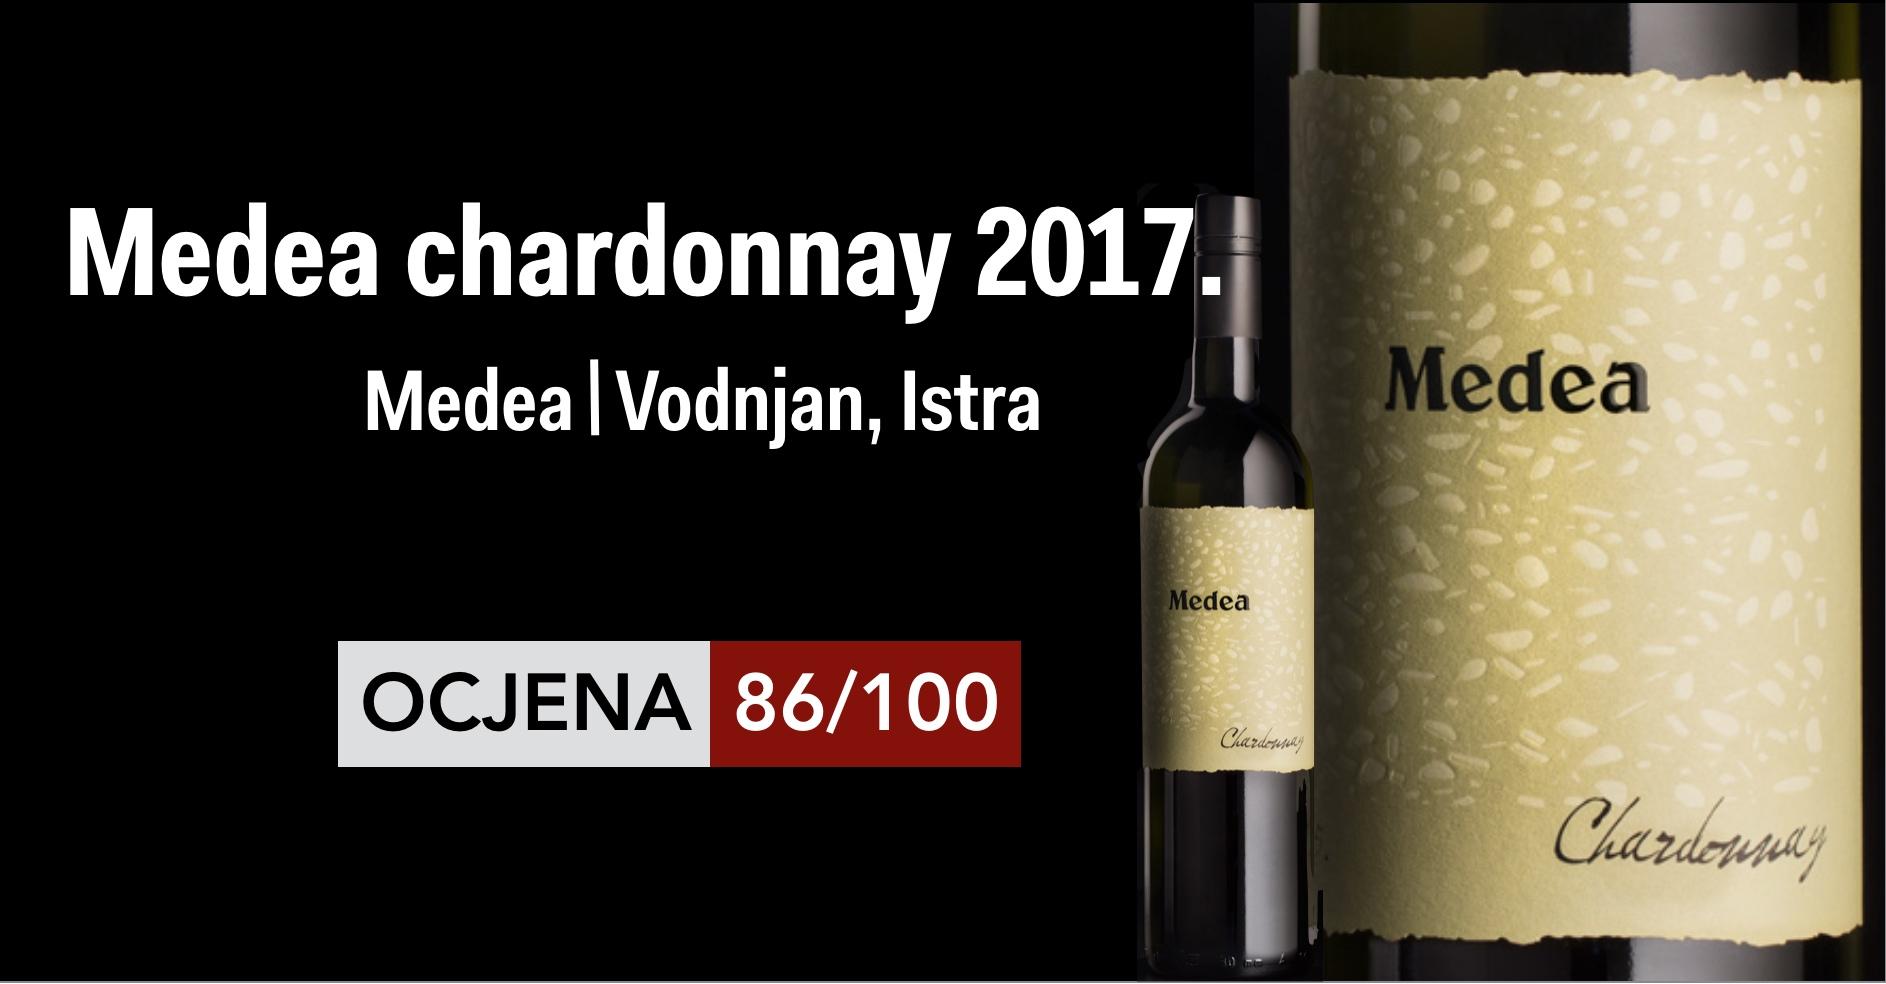 medea-chardonnay-g